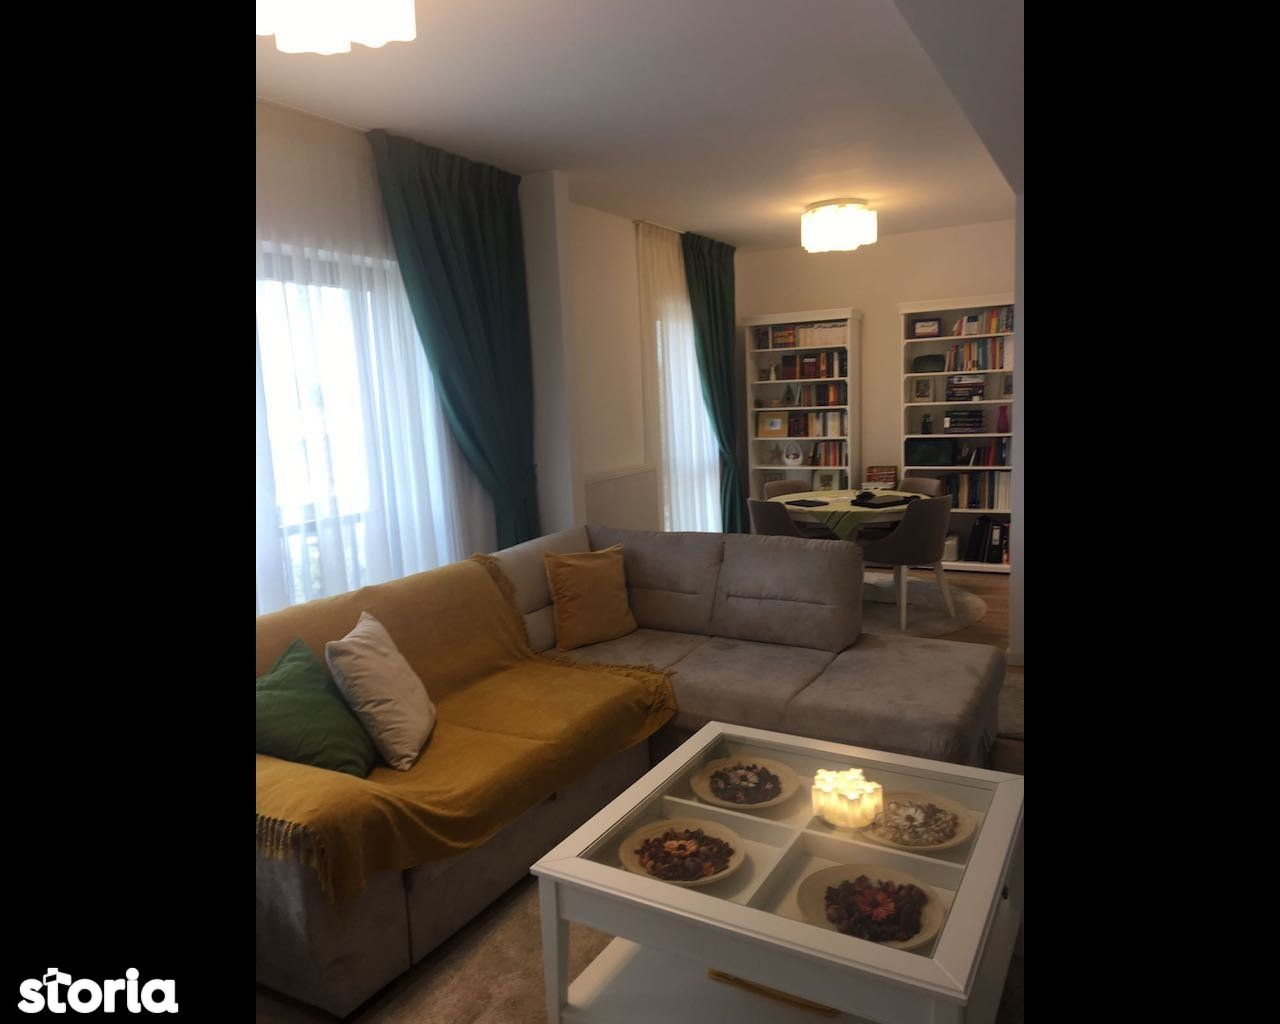 Apartament de vanzare, Bucuresti, Sectorul 1, Baneasa - Foto 10